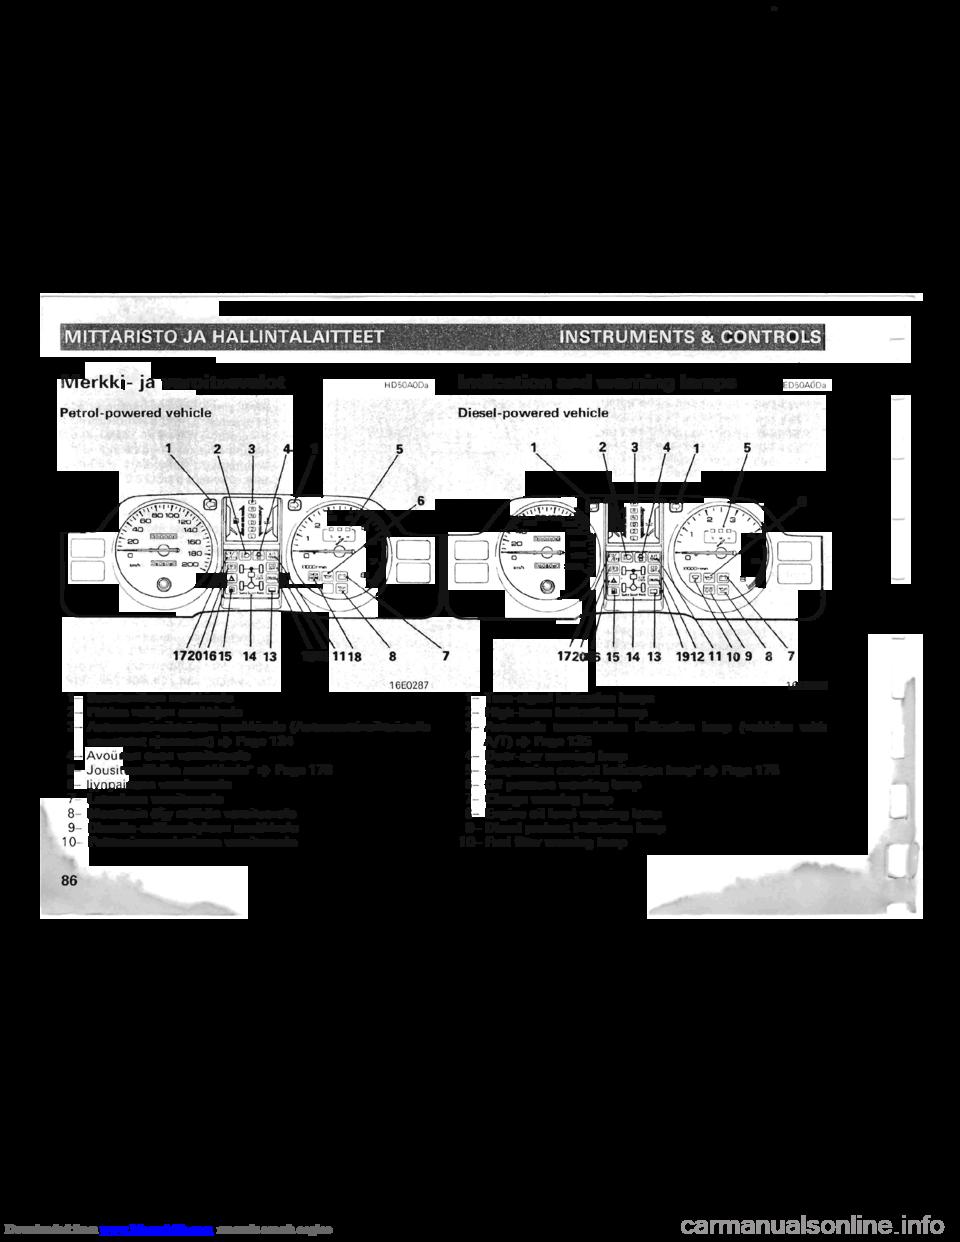 Oil Filter Mitsubishi Pajero 1996 2g Owners Manual 7 3 Fuel Diagram